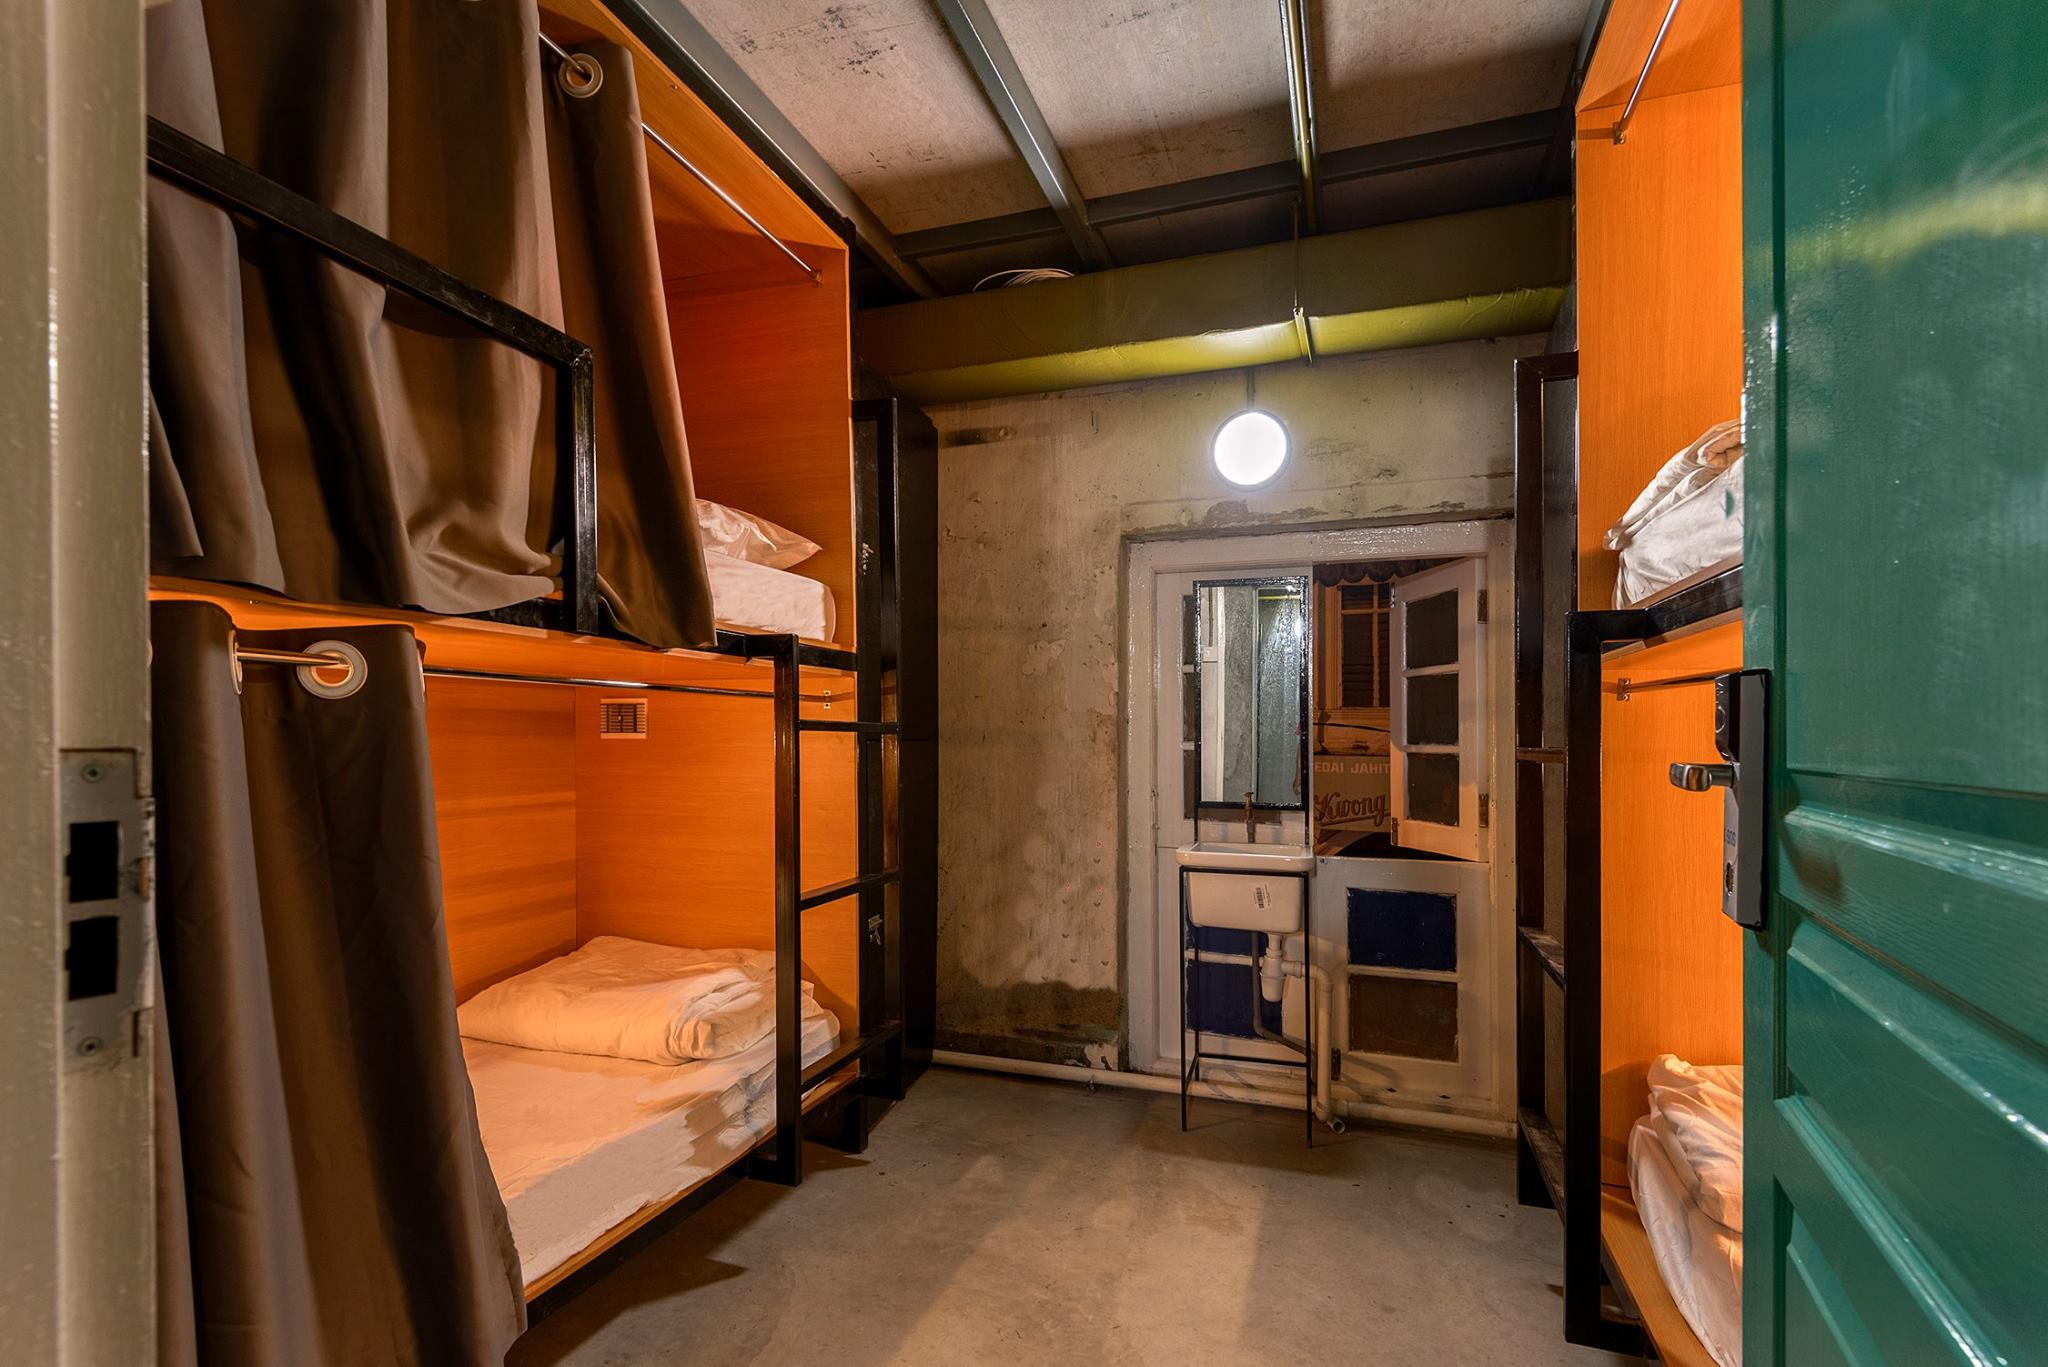 Mingle Hostel KL